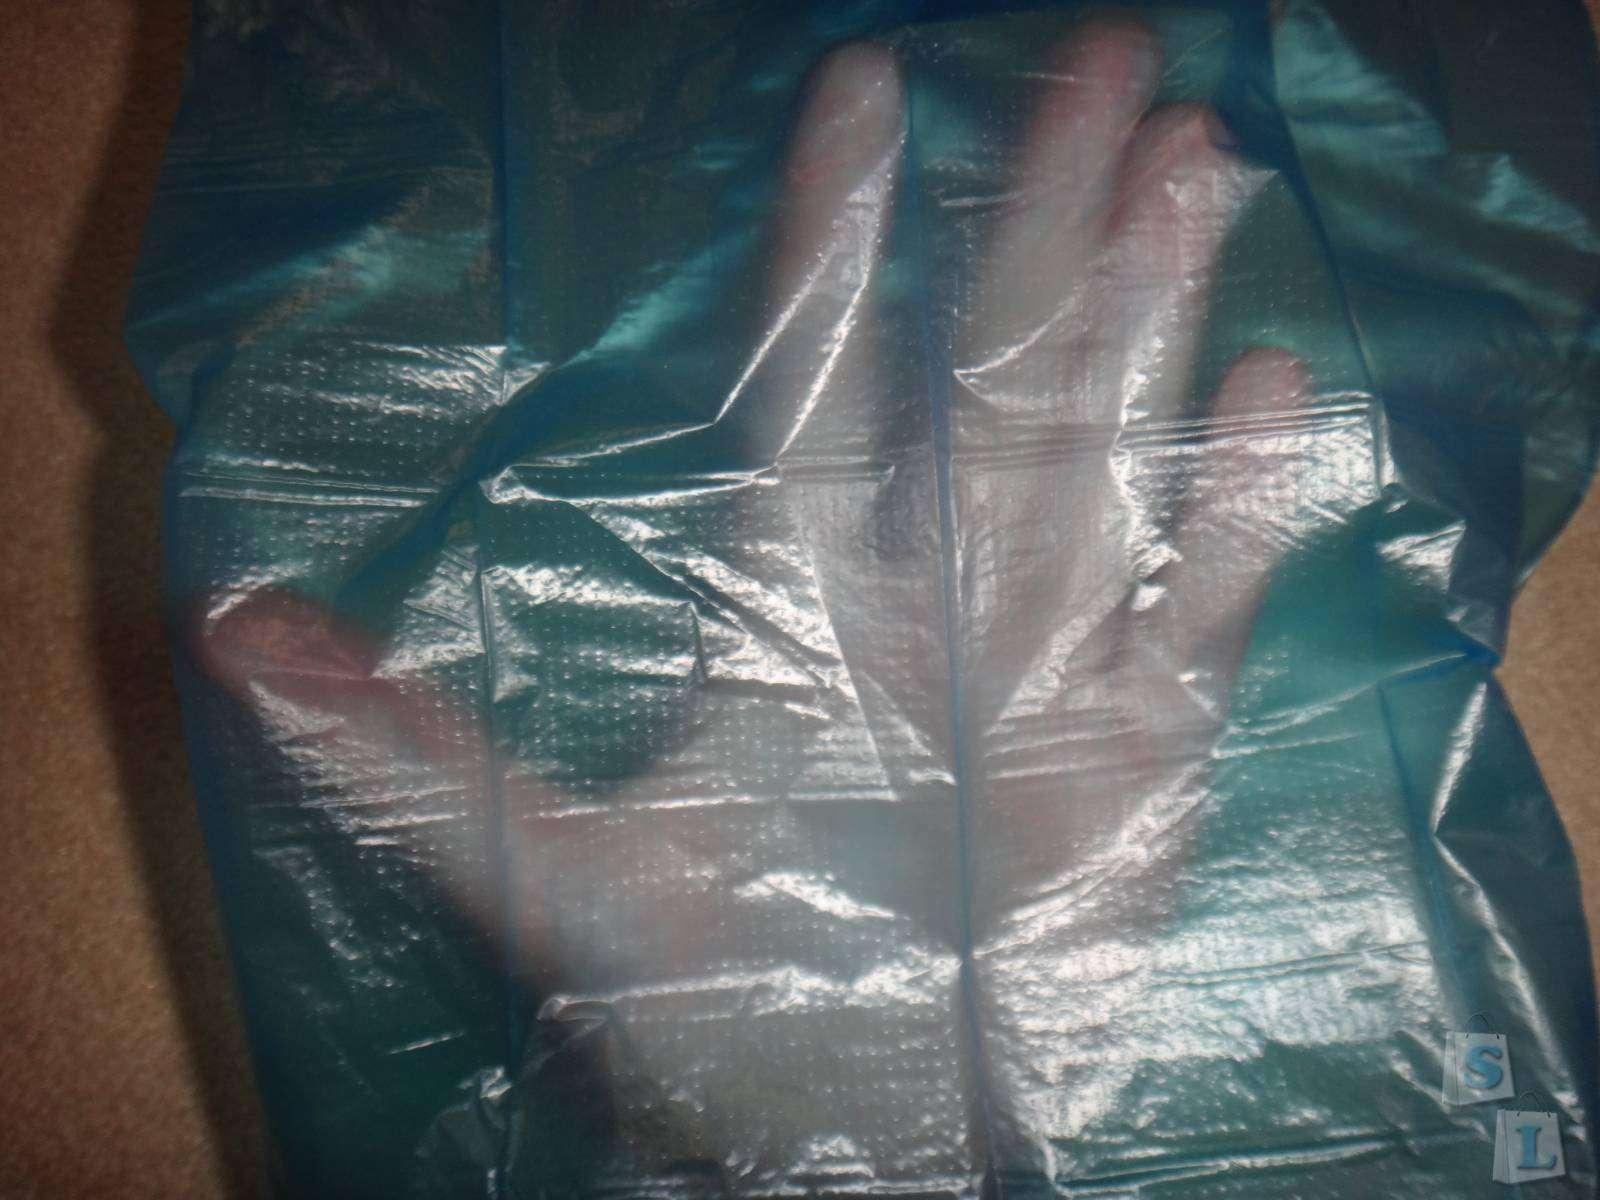 Aliexpress: Обзор  кейса в форме кости с пакетами для уборки мусора за животным